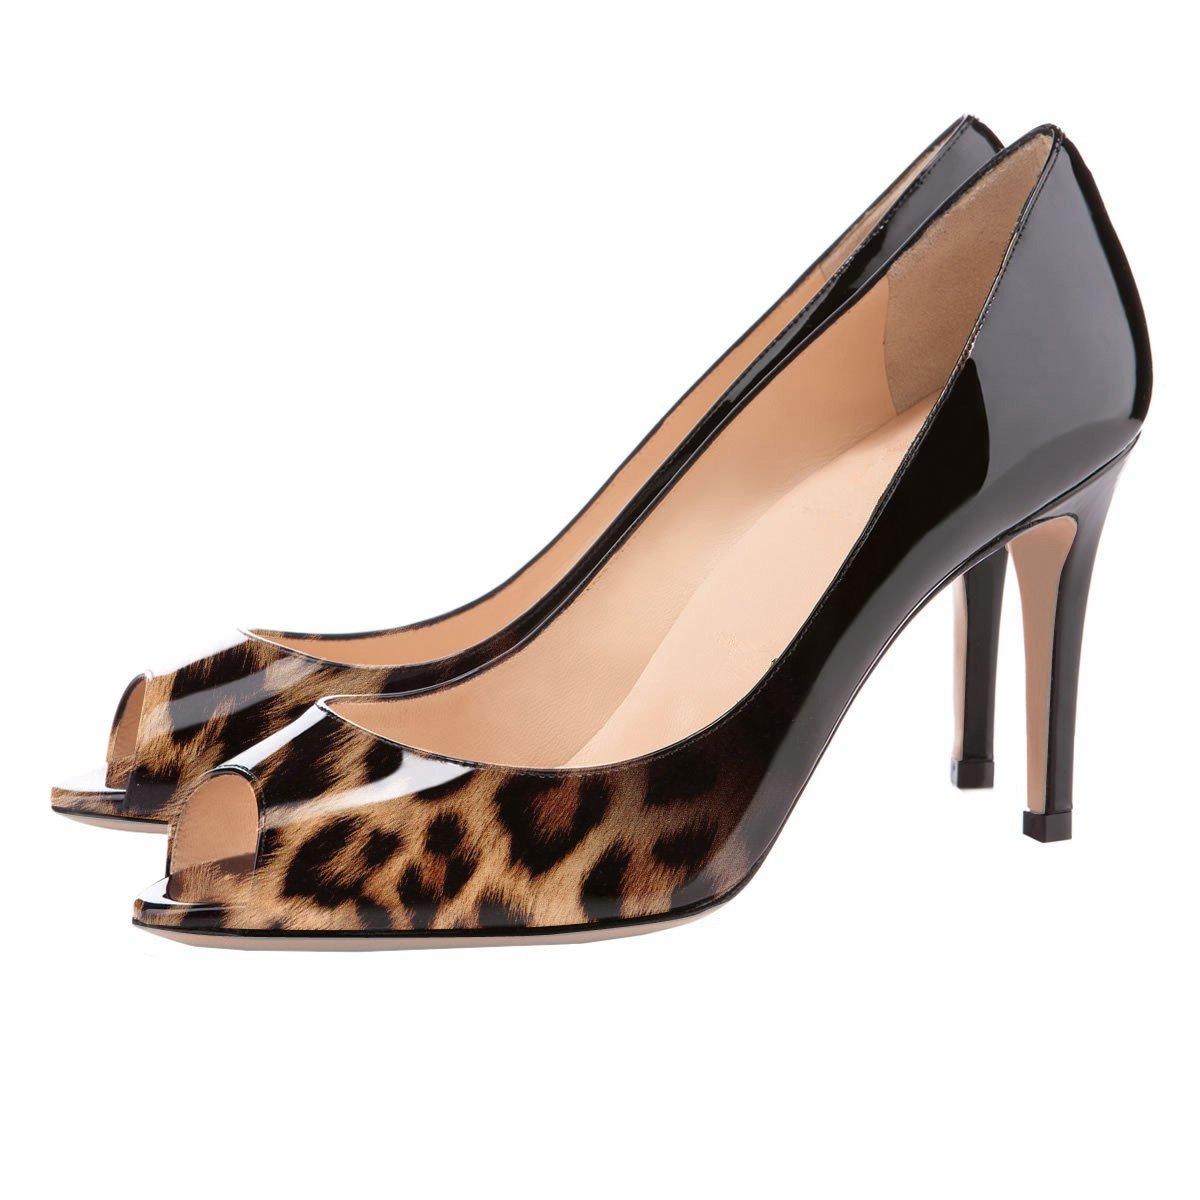 Eldof Women Peep Formal Toe Pumps Mid-Heel Pumps Formal Peep Wedding Bridal Classic Heel Open Toe Stiletto B07F1L7FW2 11.5 B(M) US|Black-leopard 729934